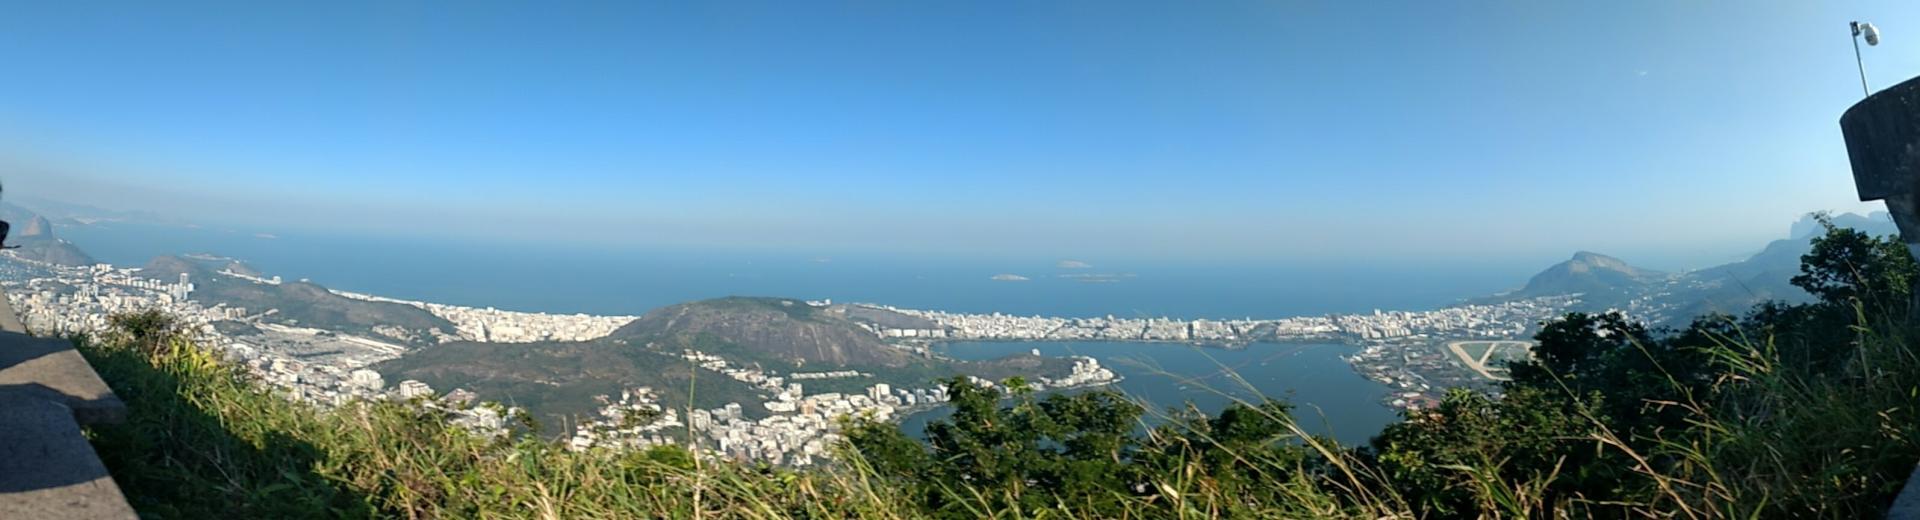 Panorama Views over Rio de Janeiro - Rio 2016